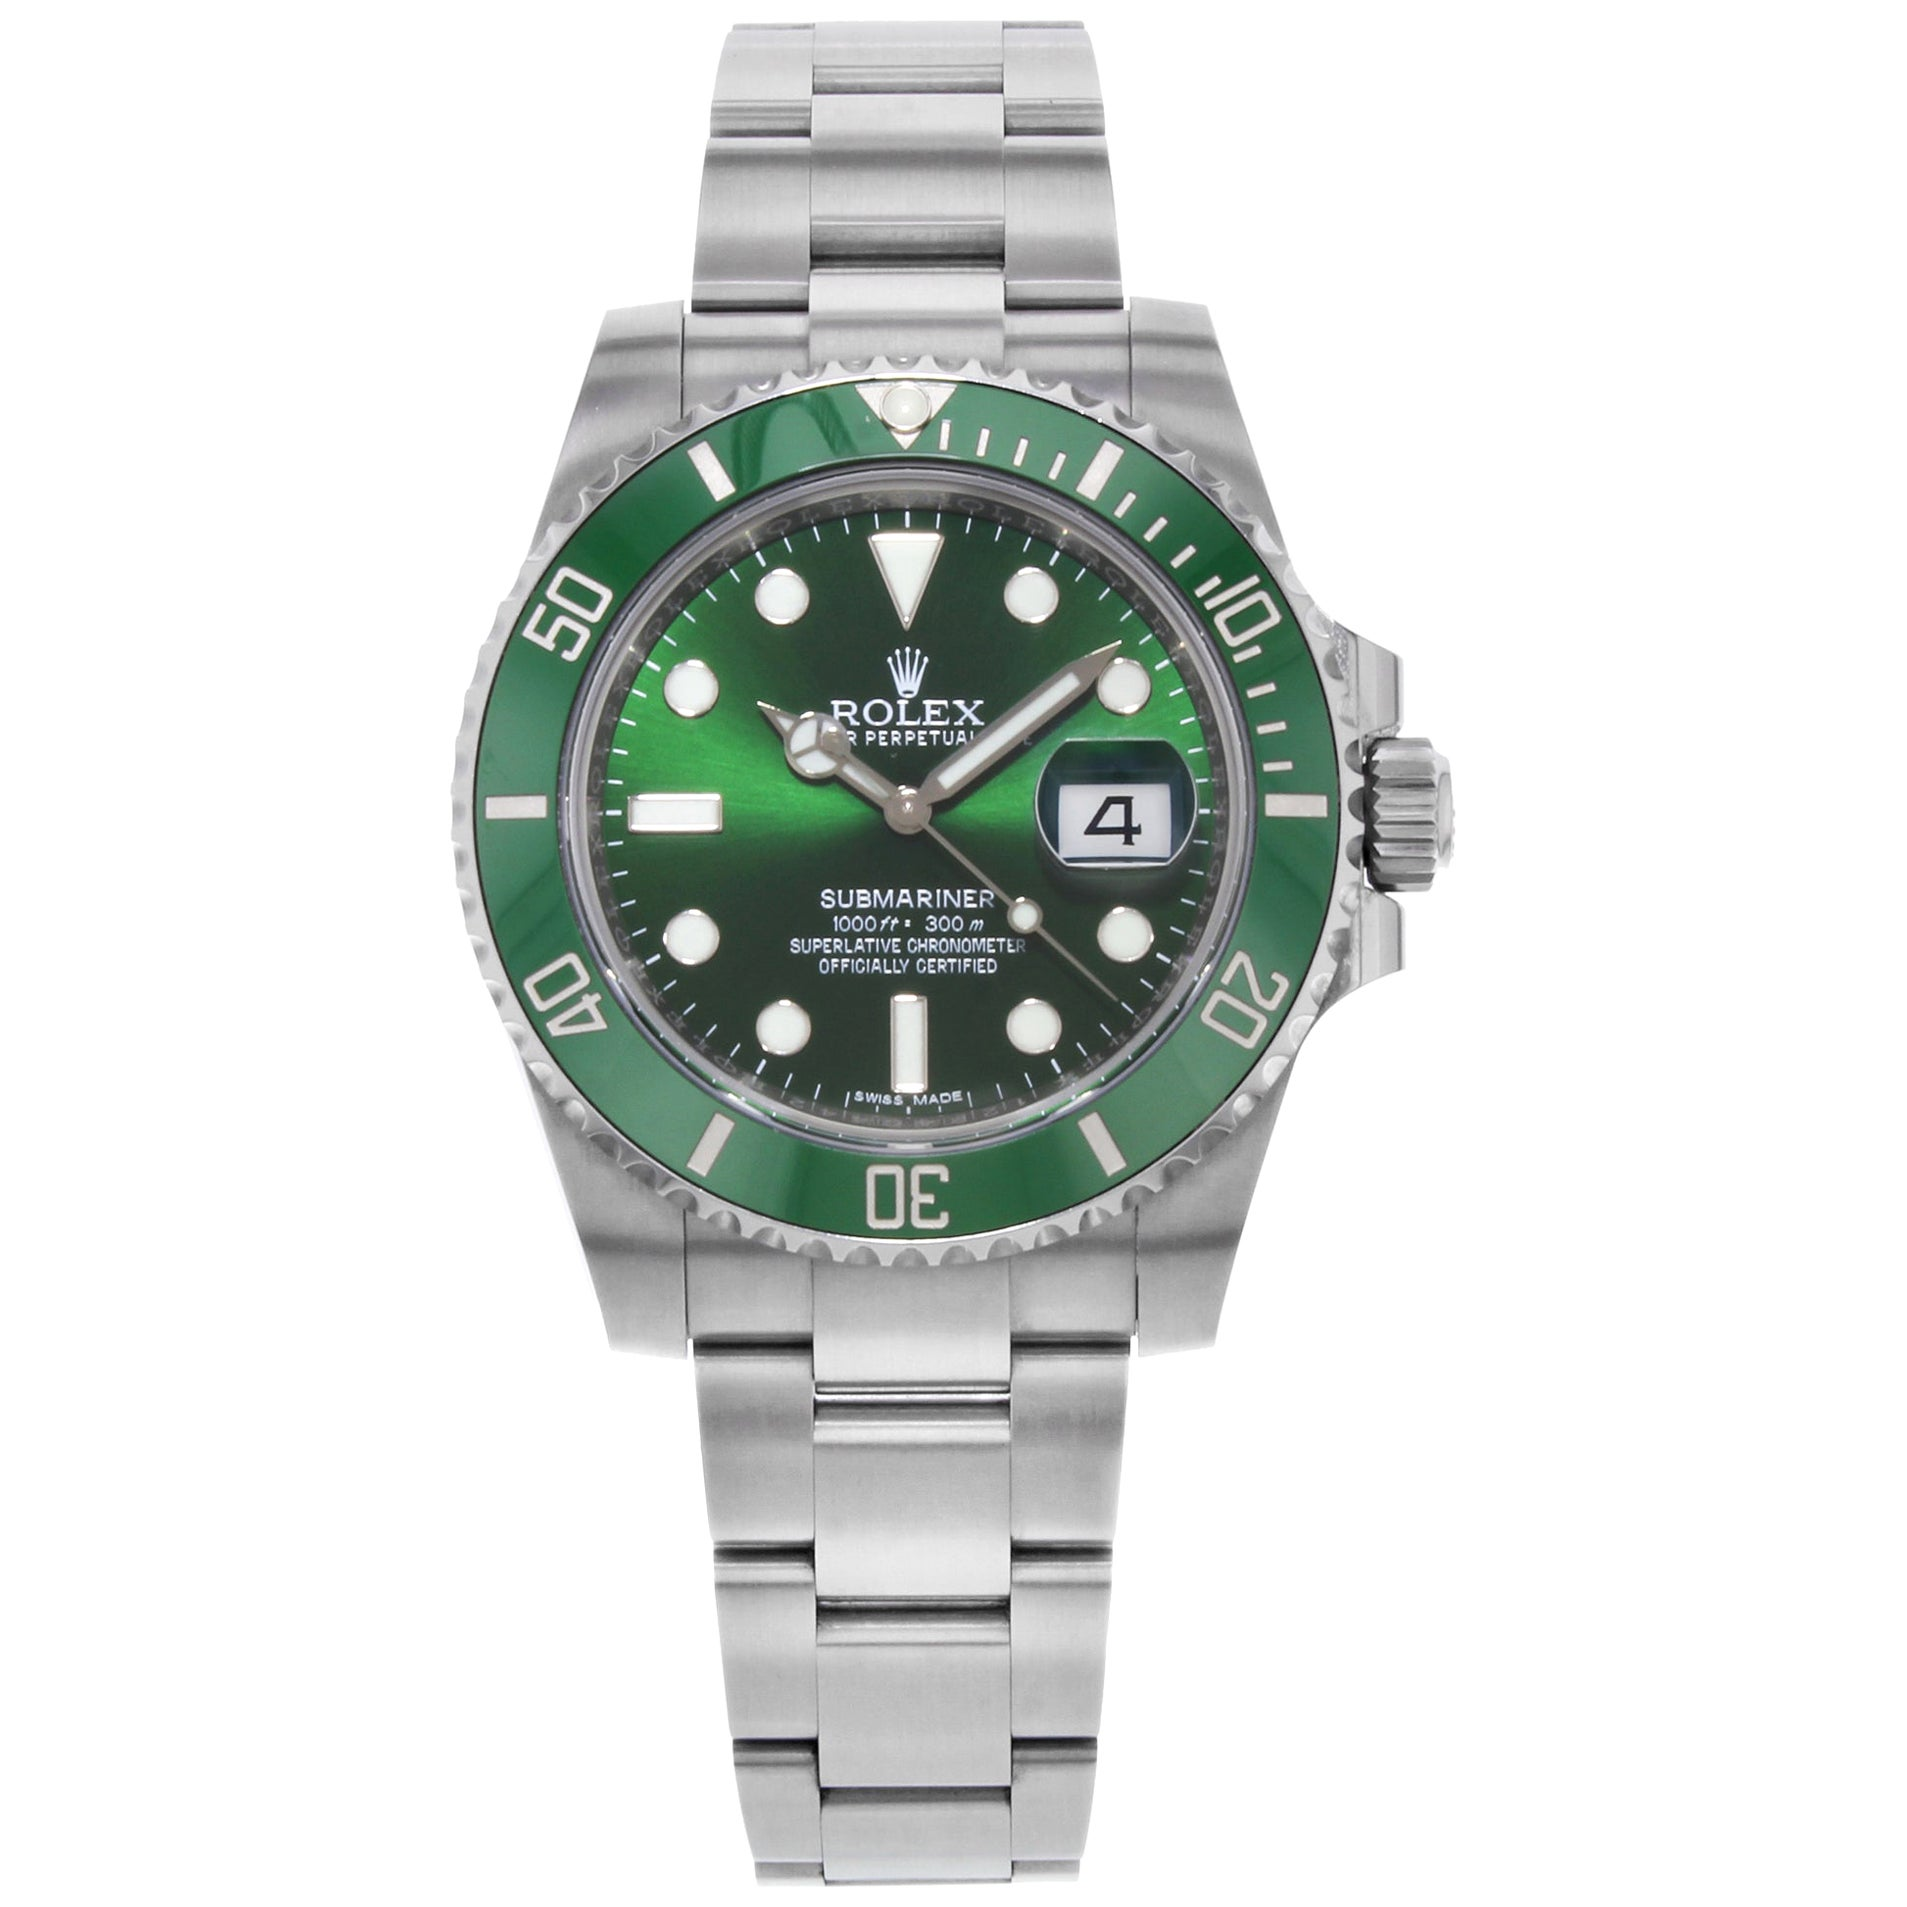 Rolex Submariner Hulk Green Steel Ceramic Automatic Men's Watch 116610LV